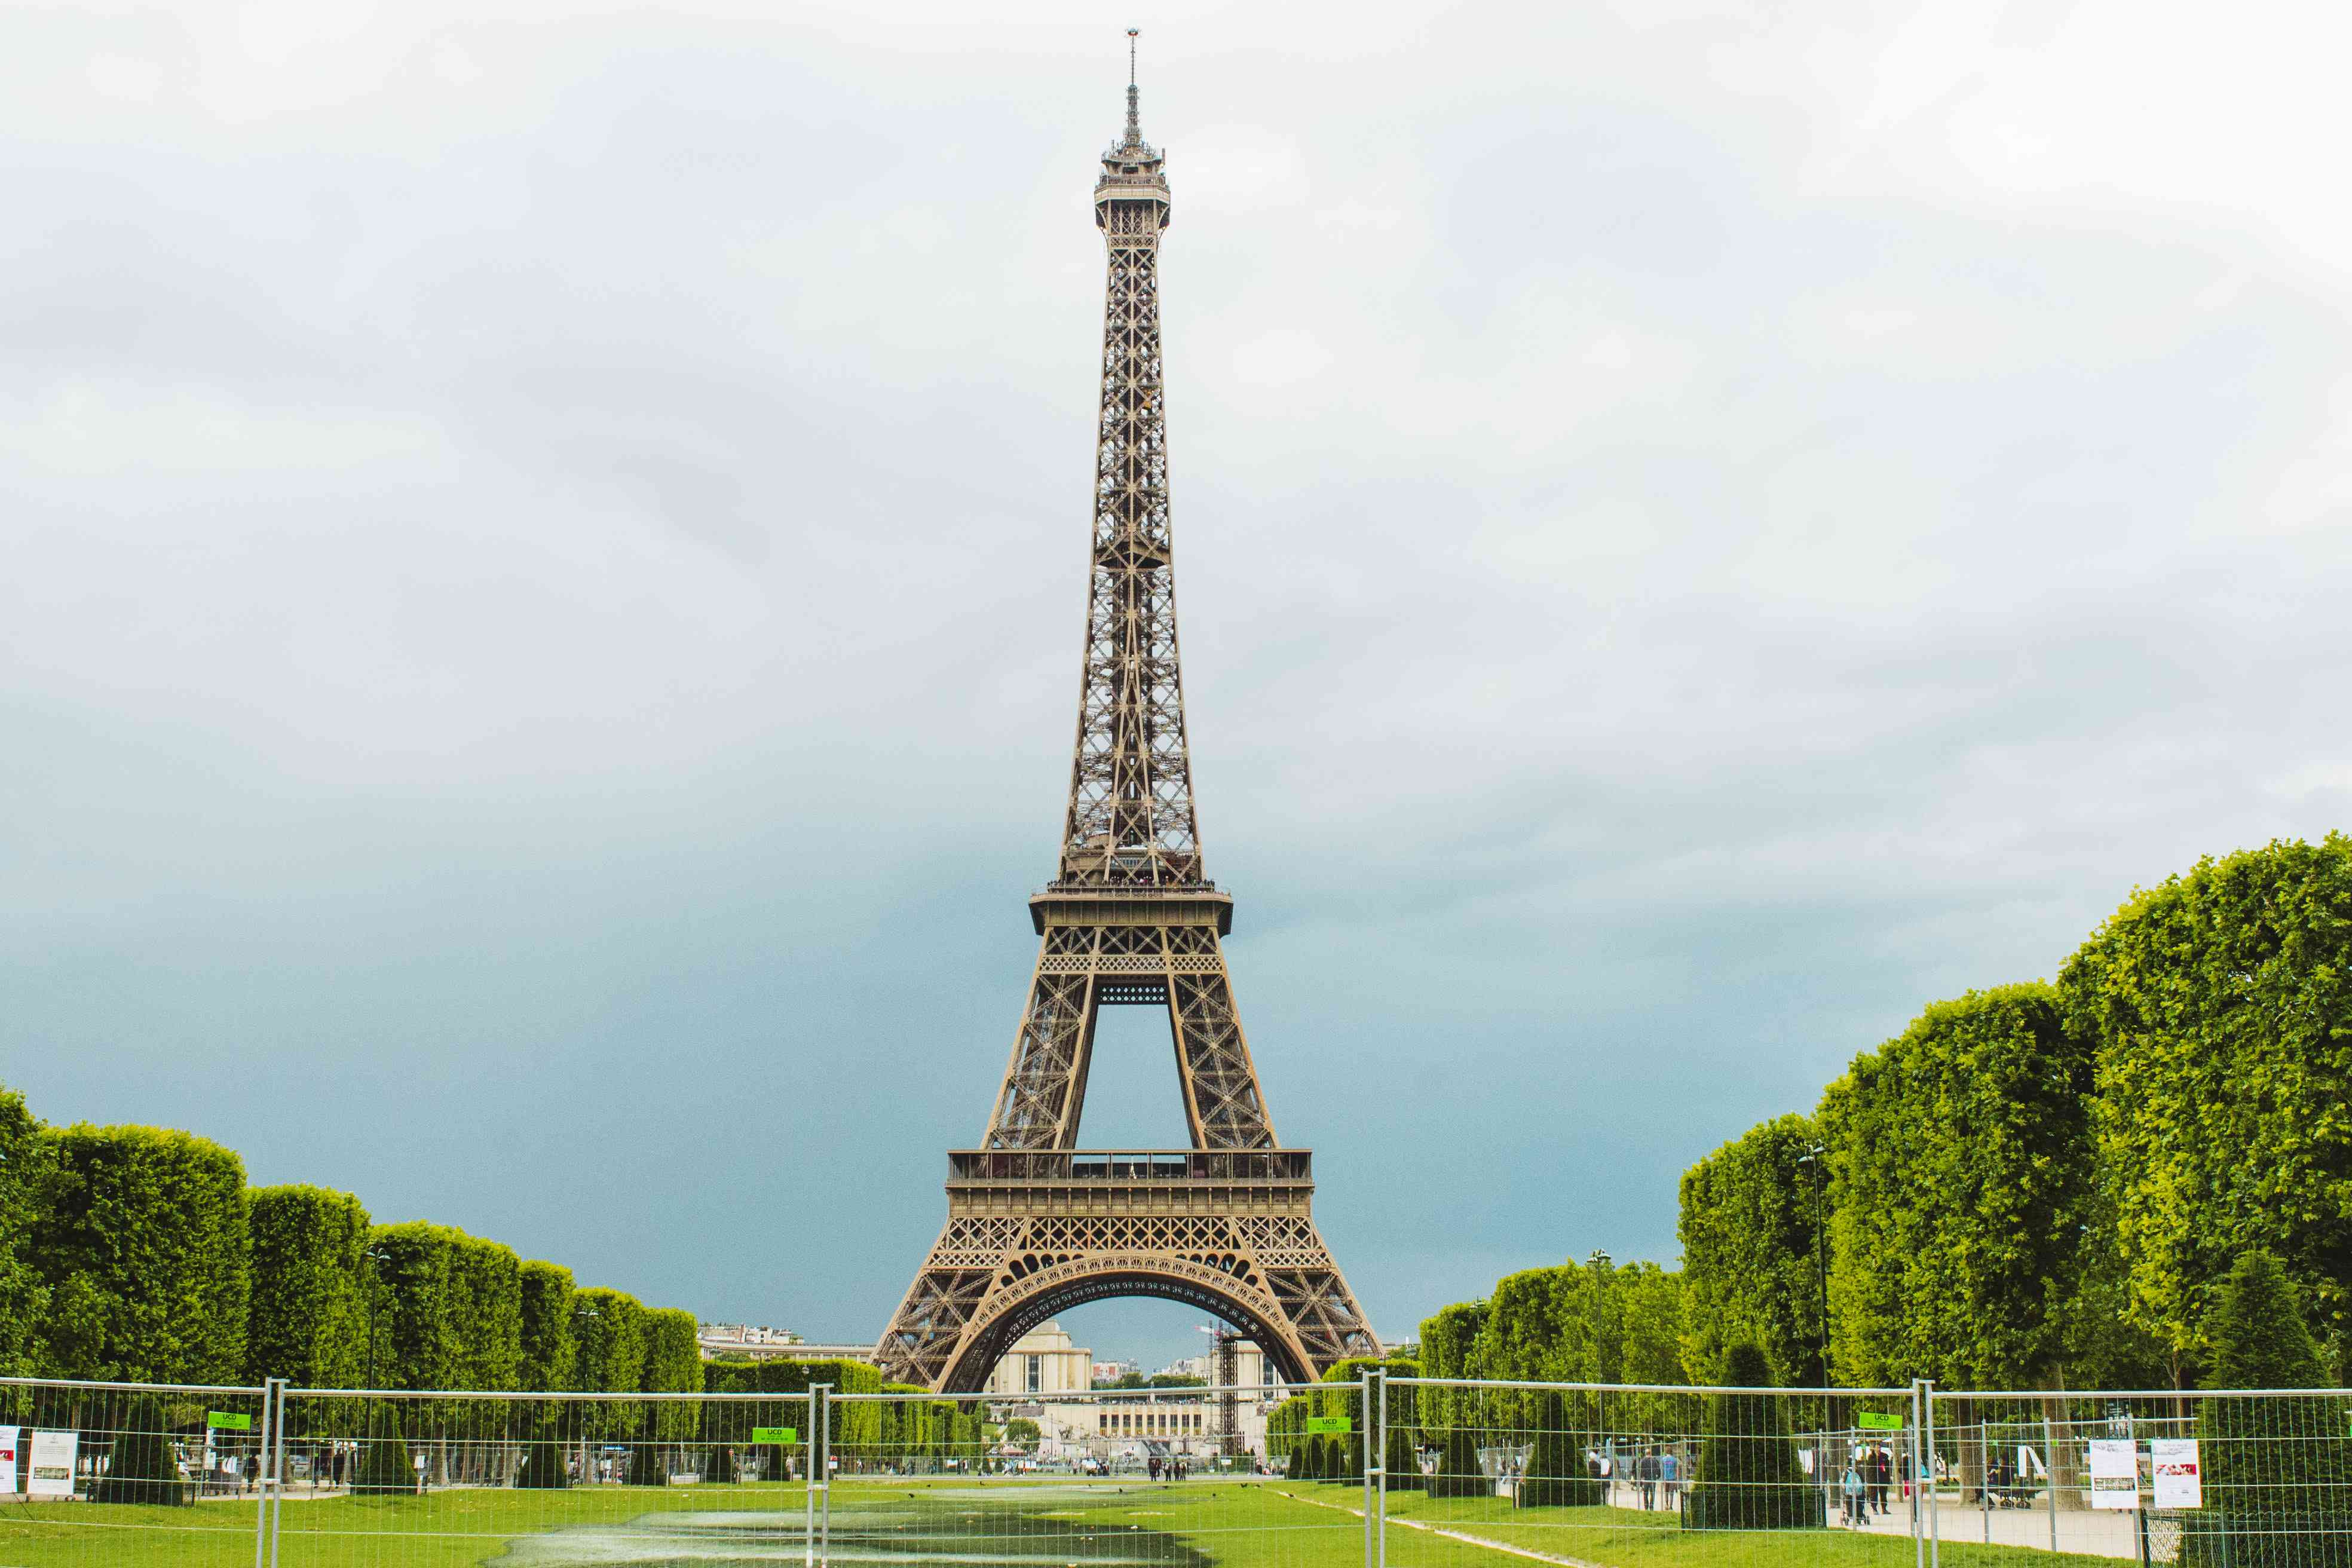 The Eiffel tower in Champ de Mars